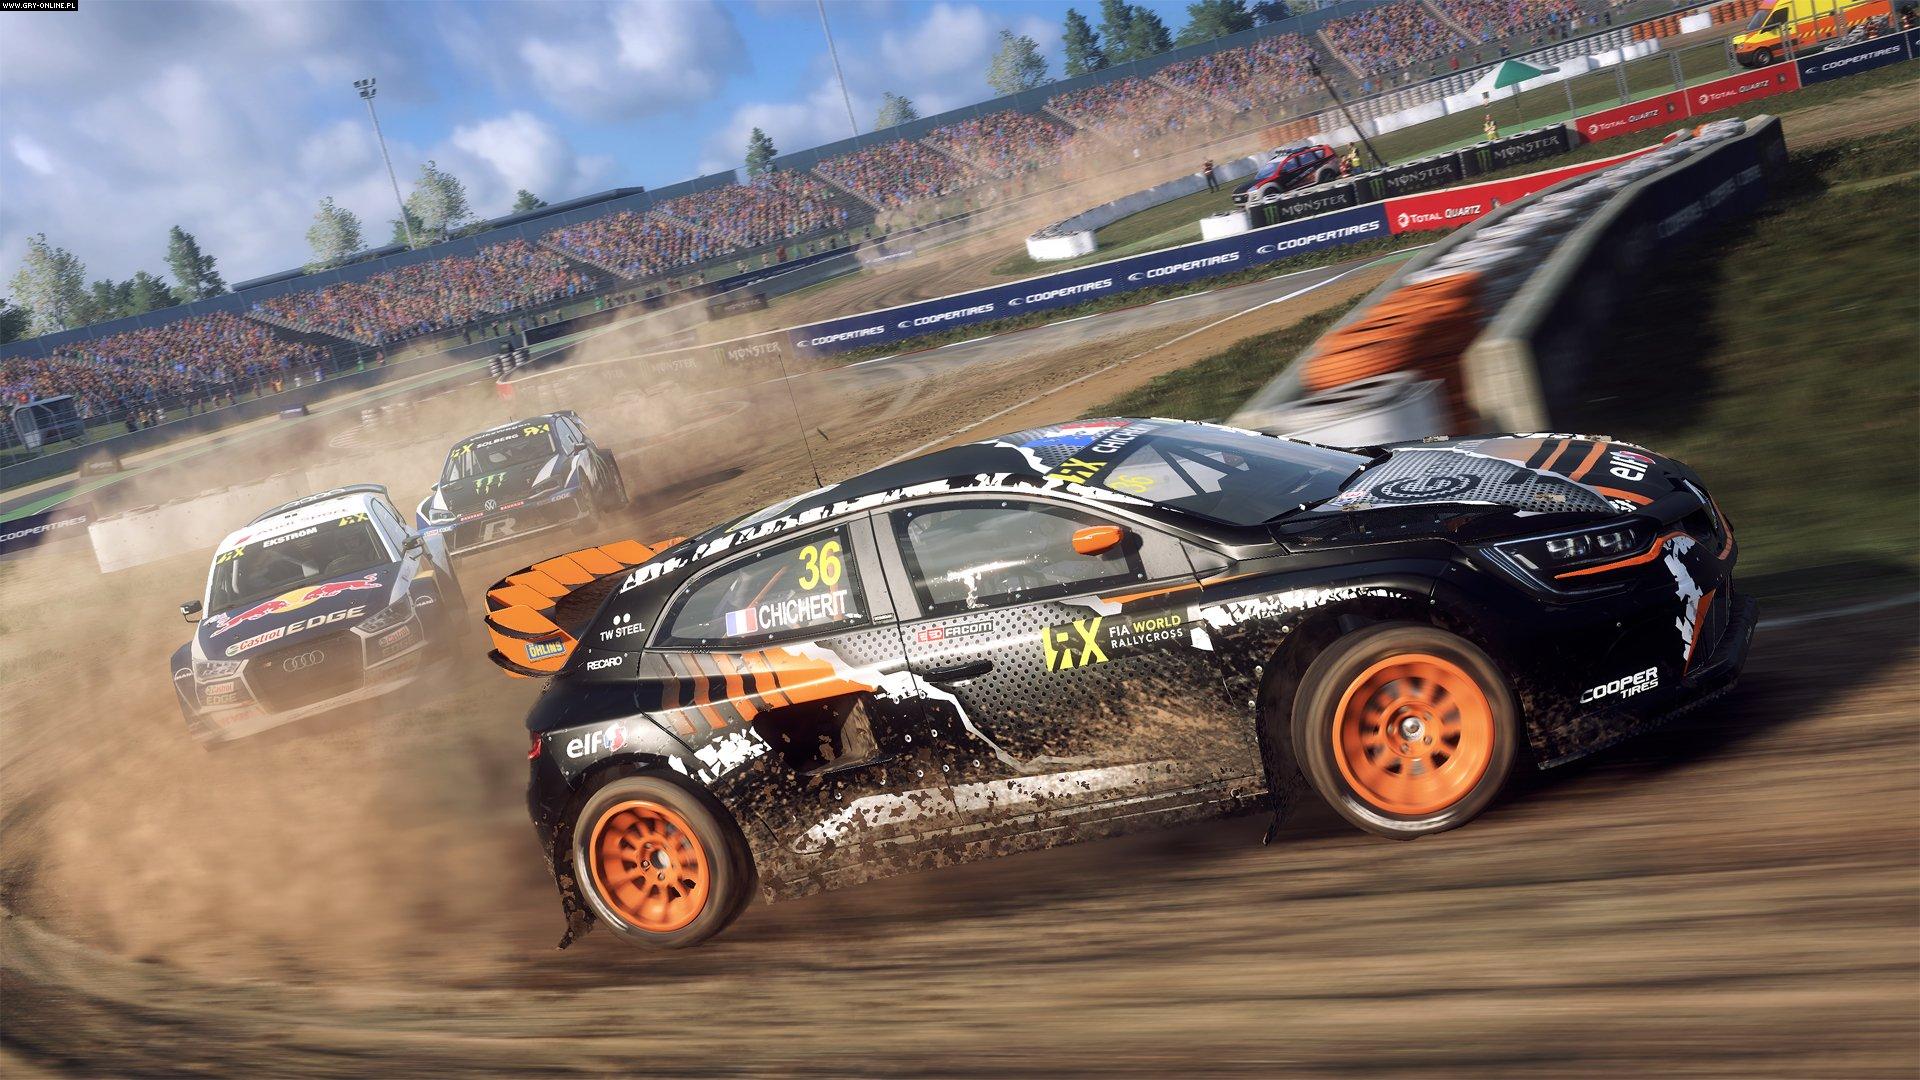 DiRT Rally 2.0 PC, PS4, XONE Games Image 9/49, Codemasters Software